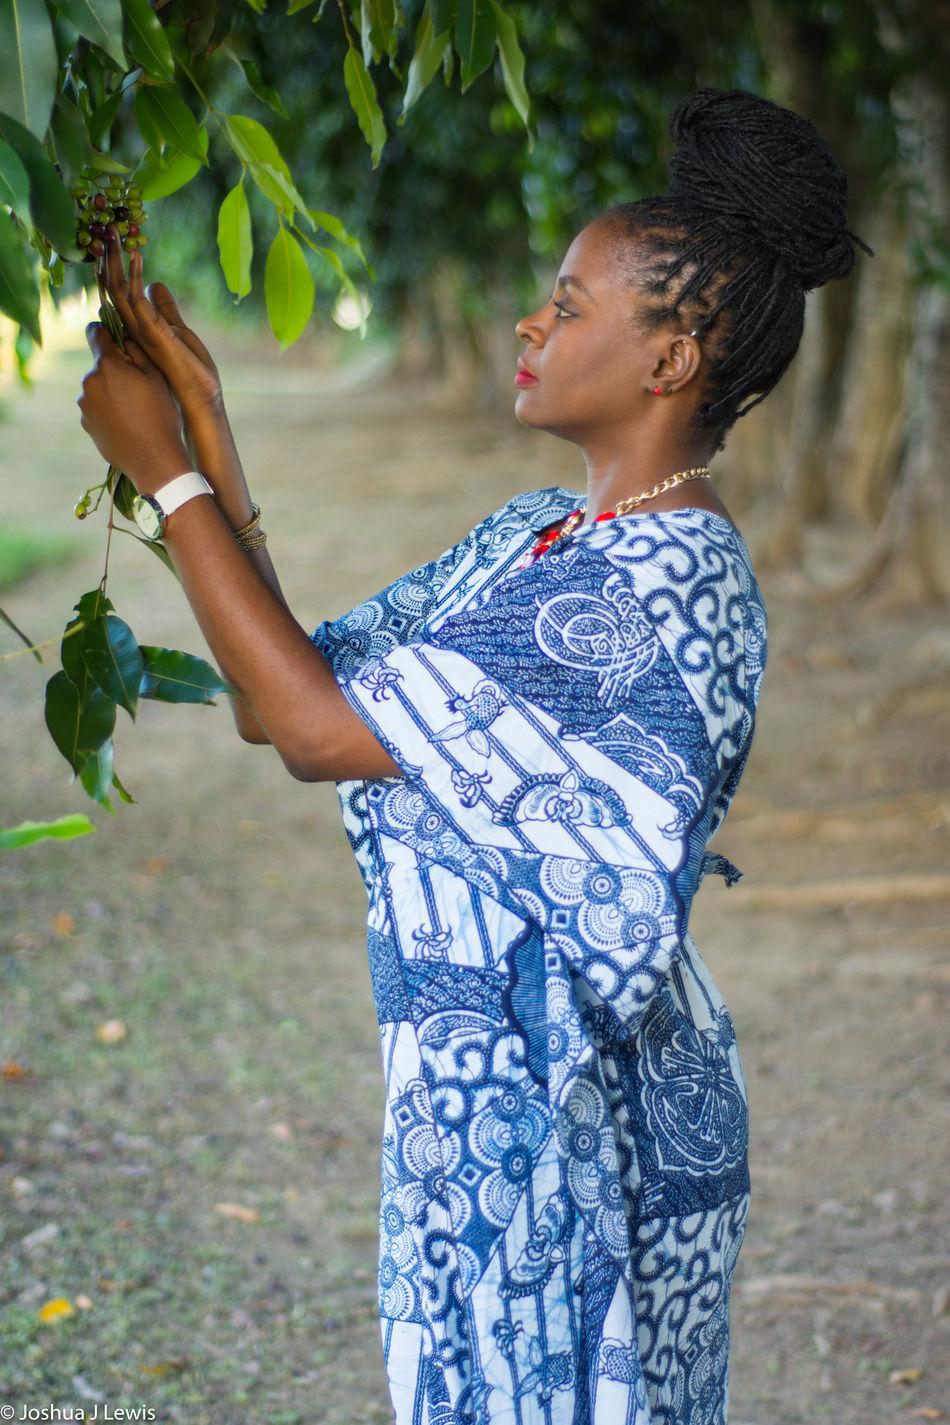 Empress Rastafari Person Young Adult Beautiful Nature Photoshoot Beauty In Nature Outdoors Trinidad And Tobago Caribbean Beautiful People Stillife Portrait